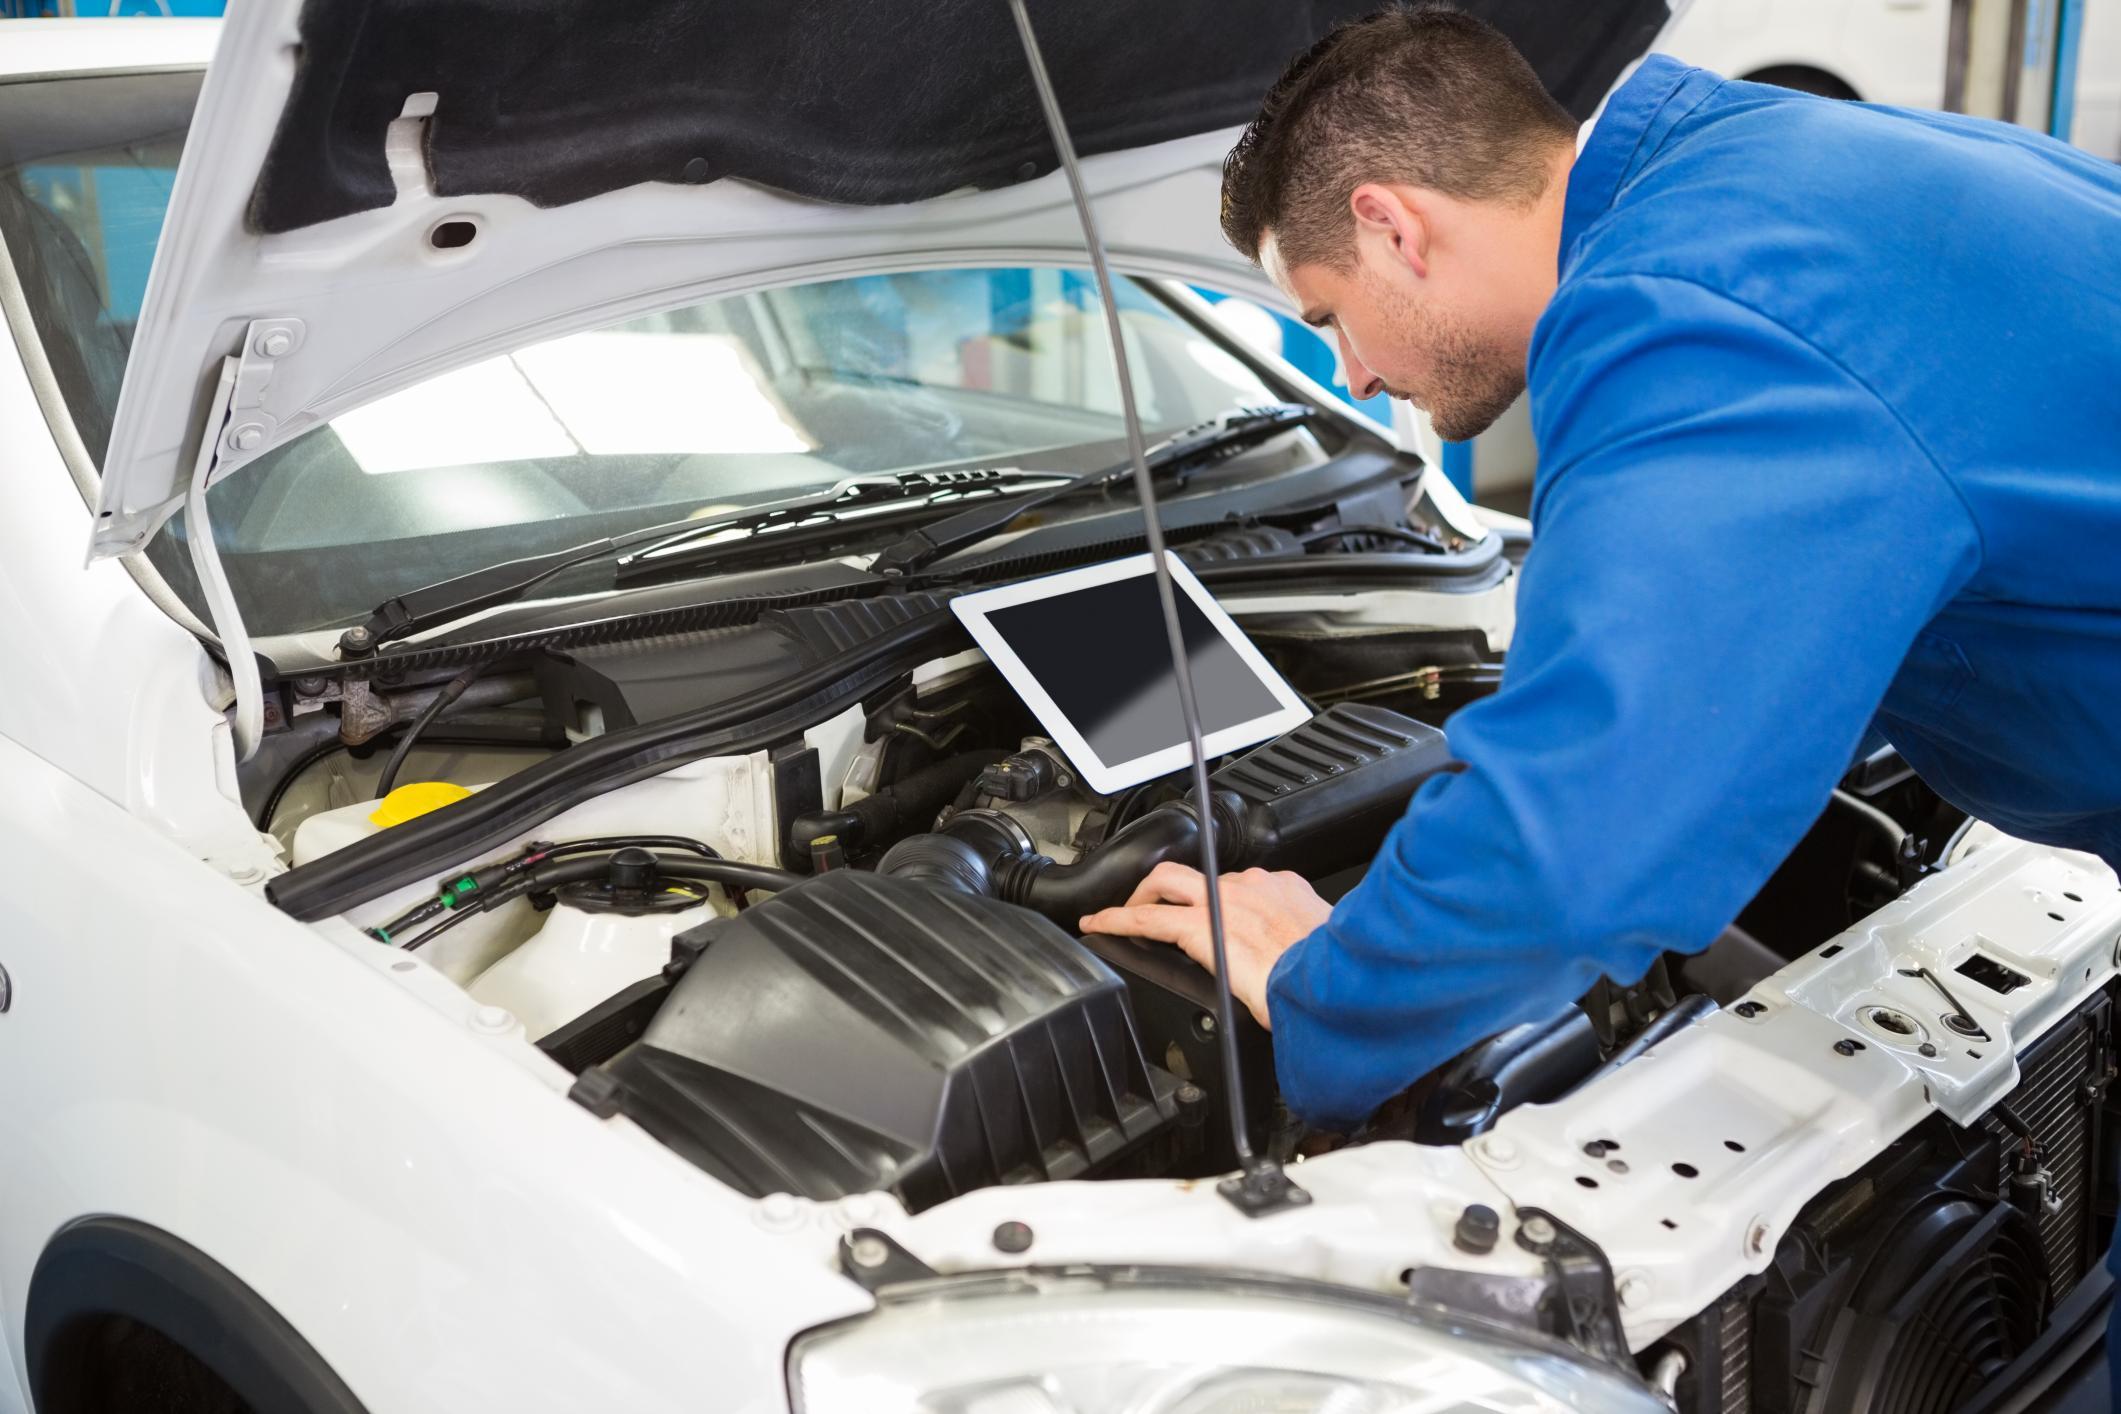 Tampa's-Best-Mobile-Mechanic-Diagnostics-2